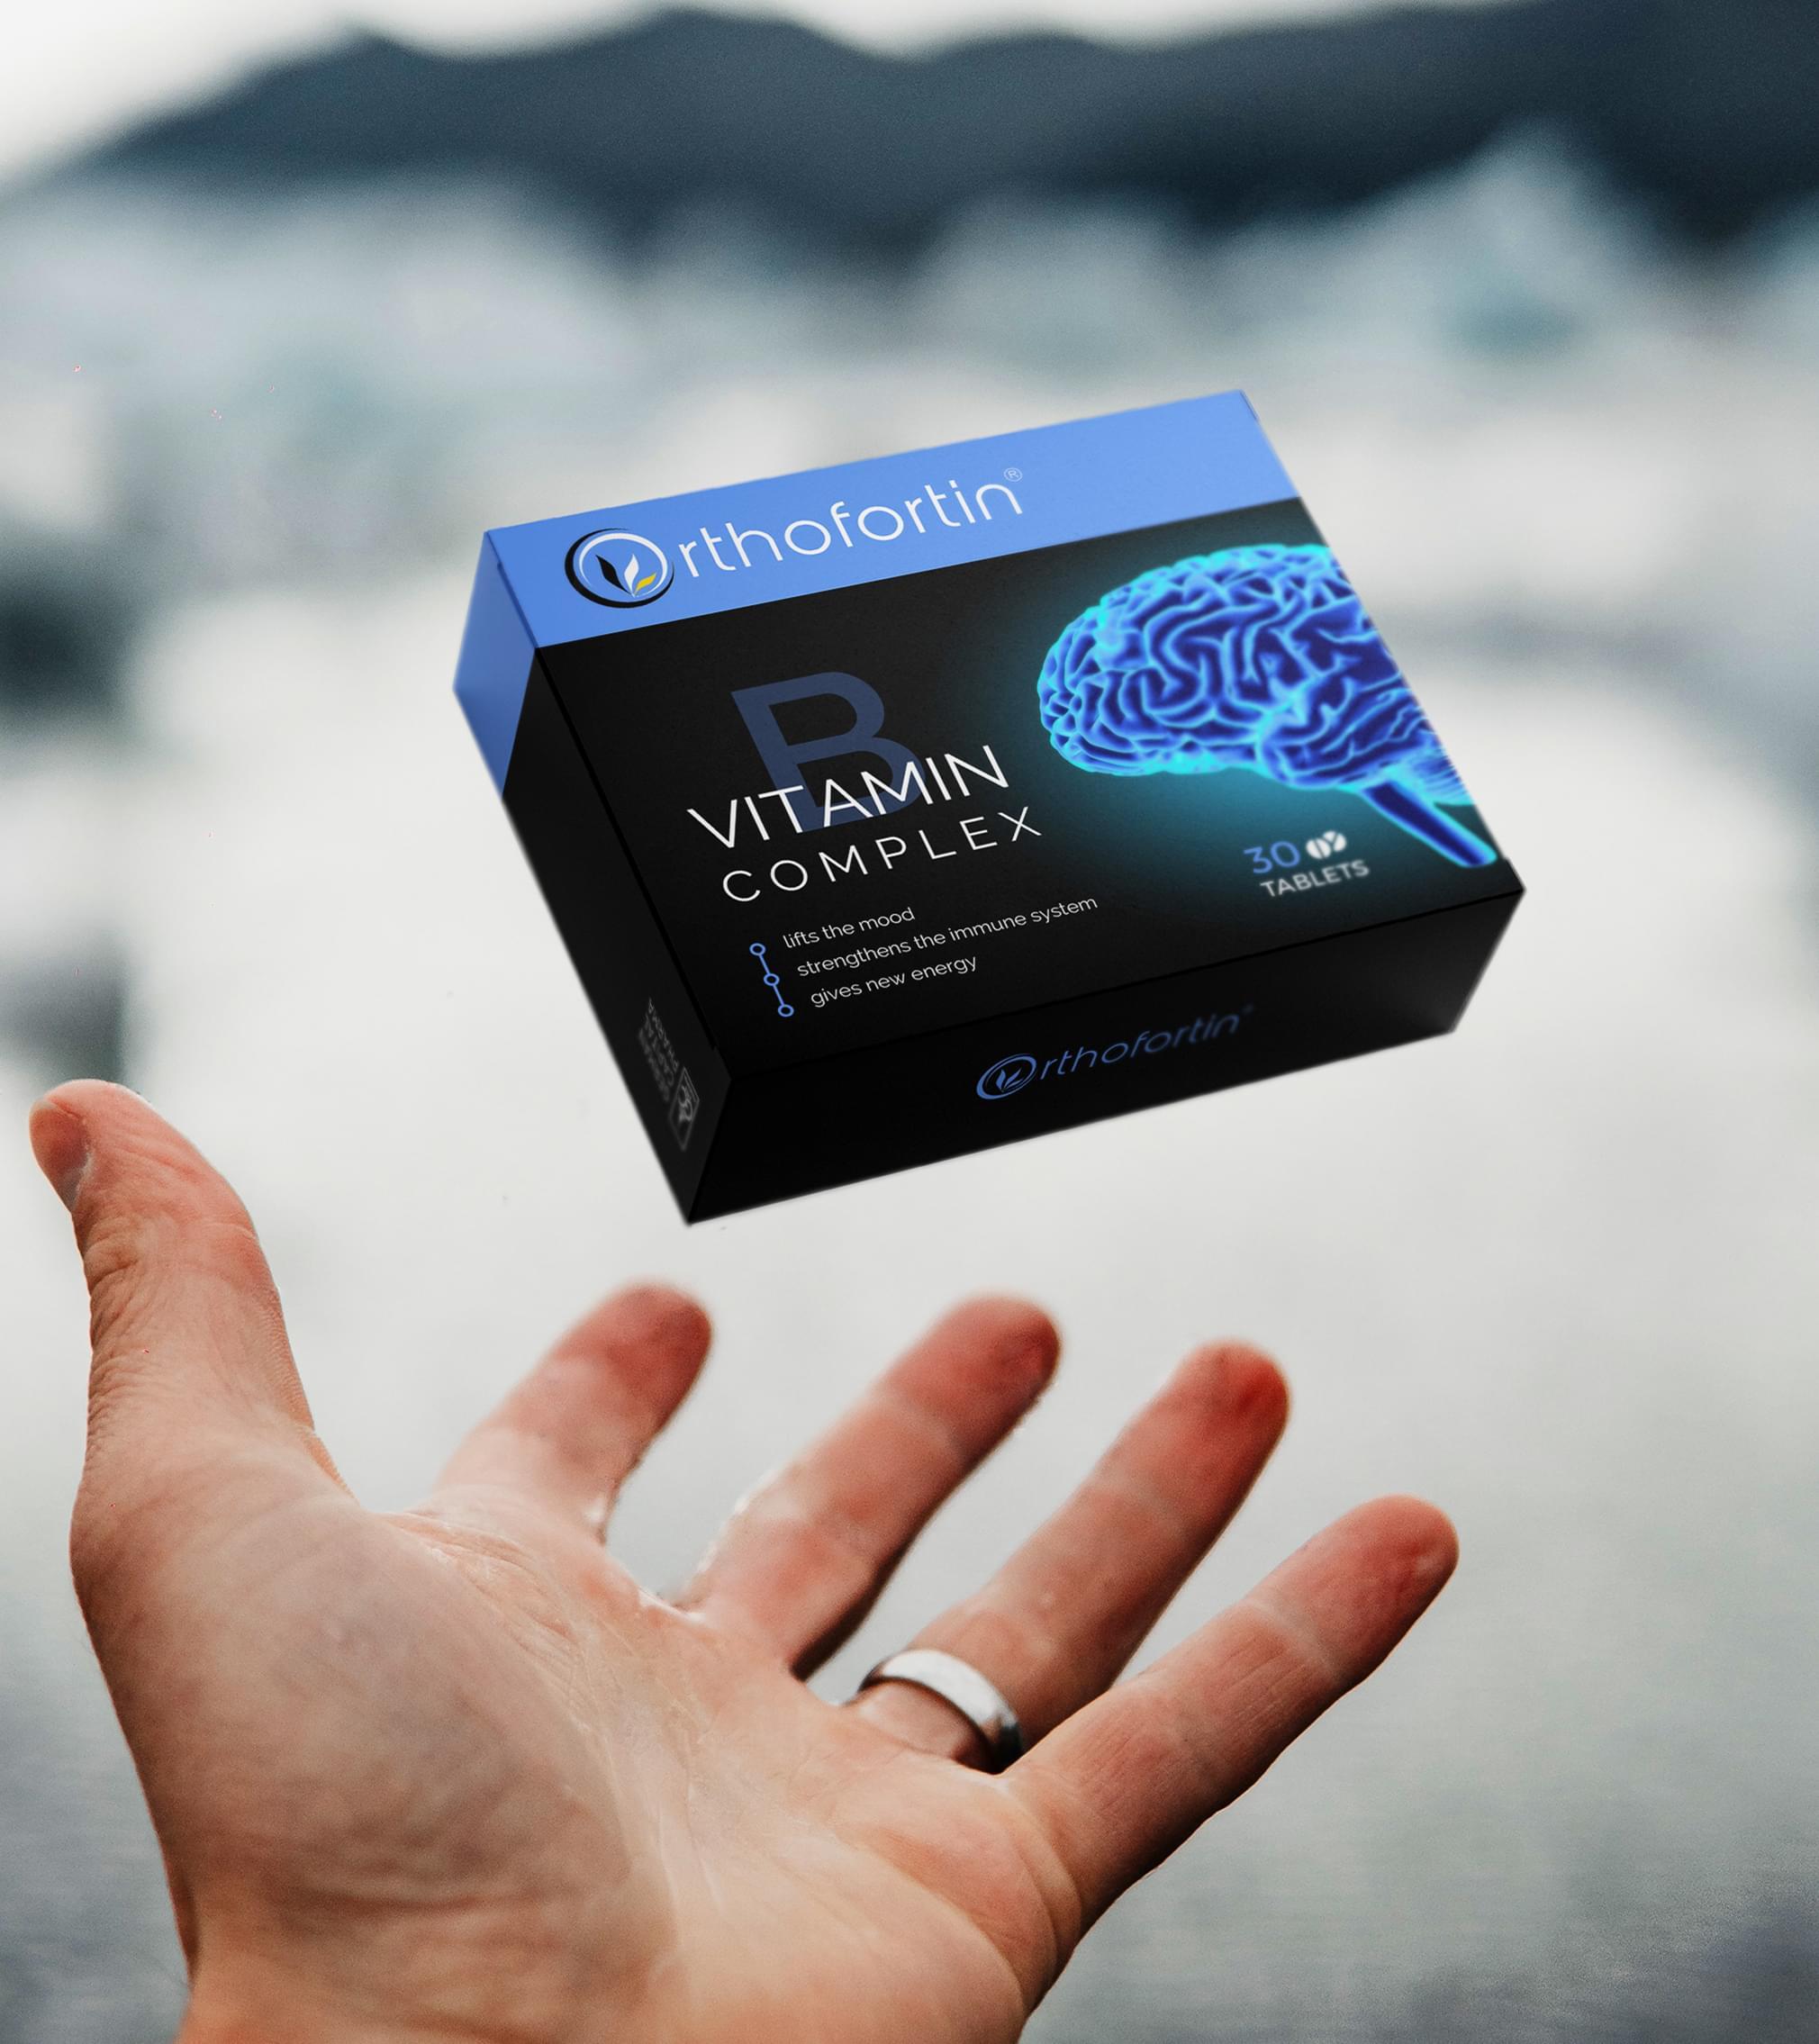 ORTHOFORTIN Packaging